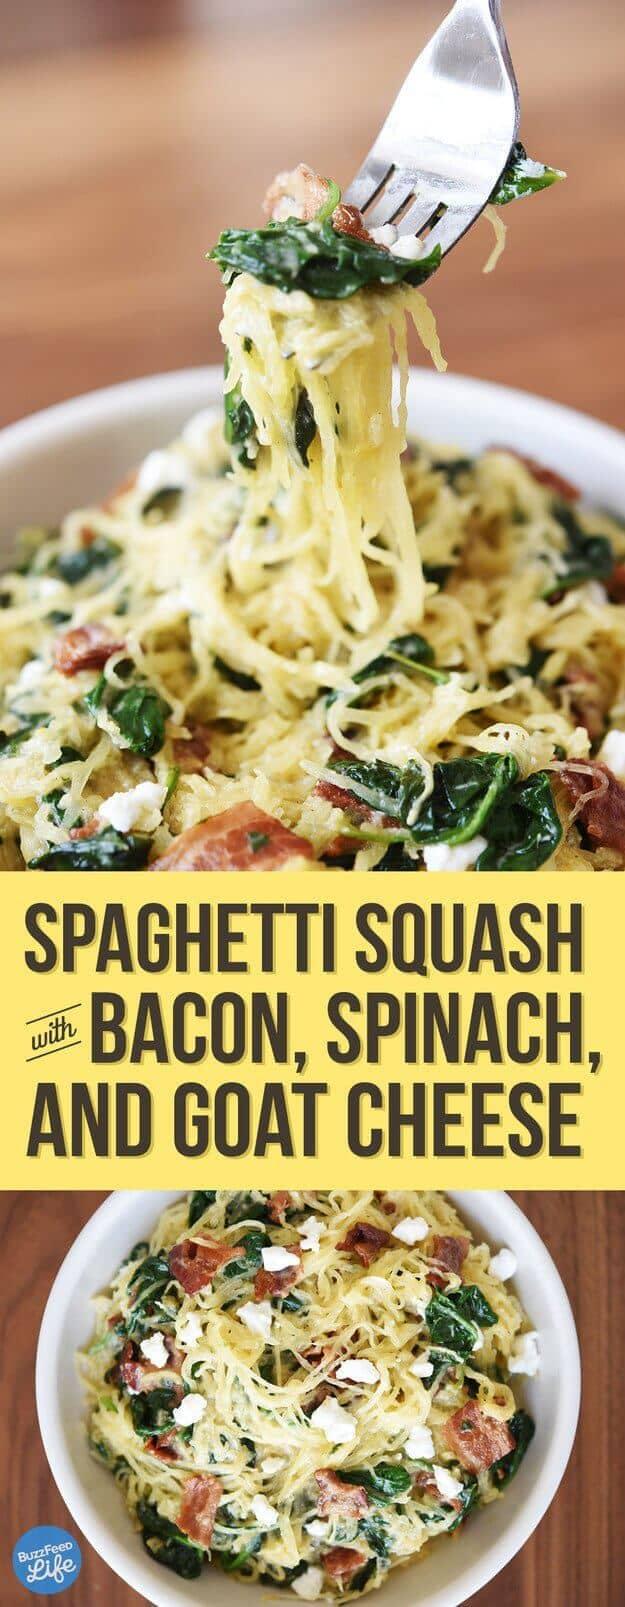 Spaghetti Squash and Bacon Dish